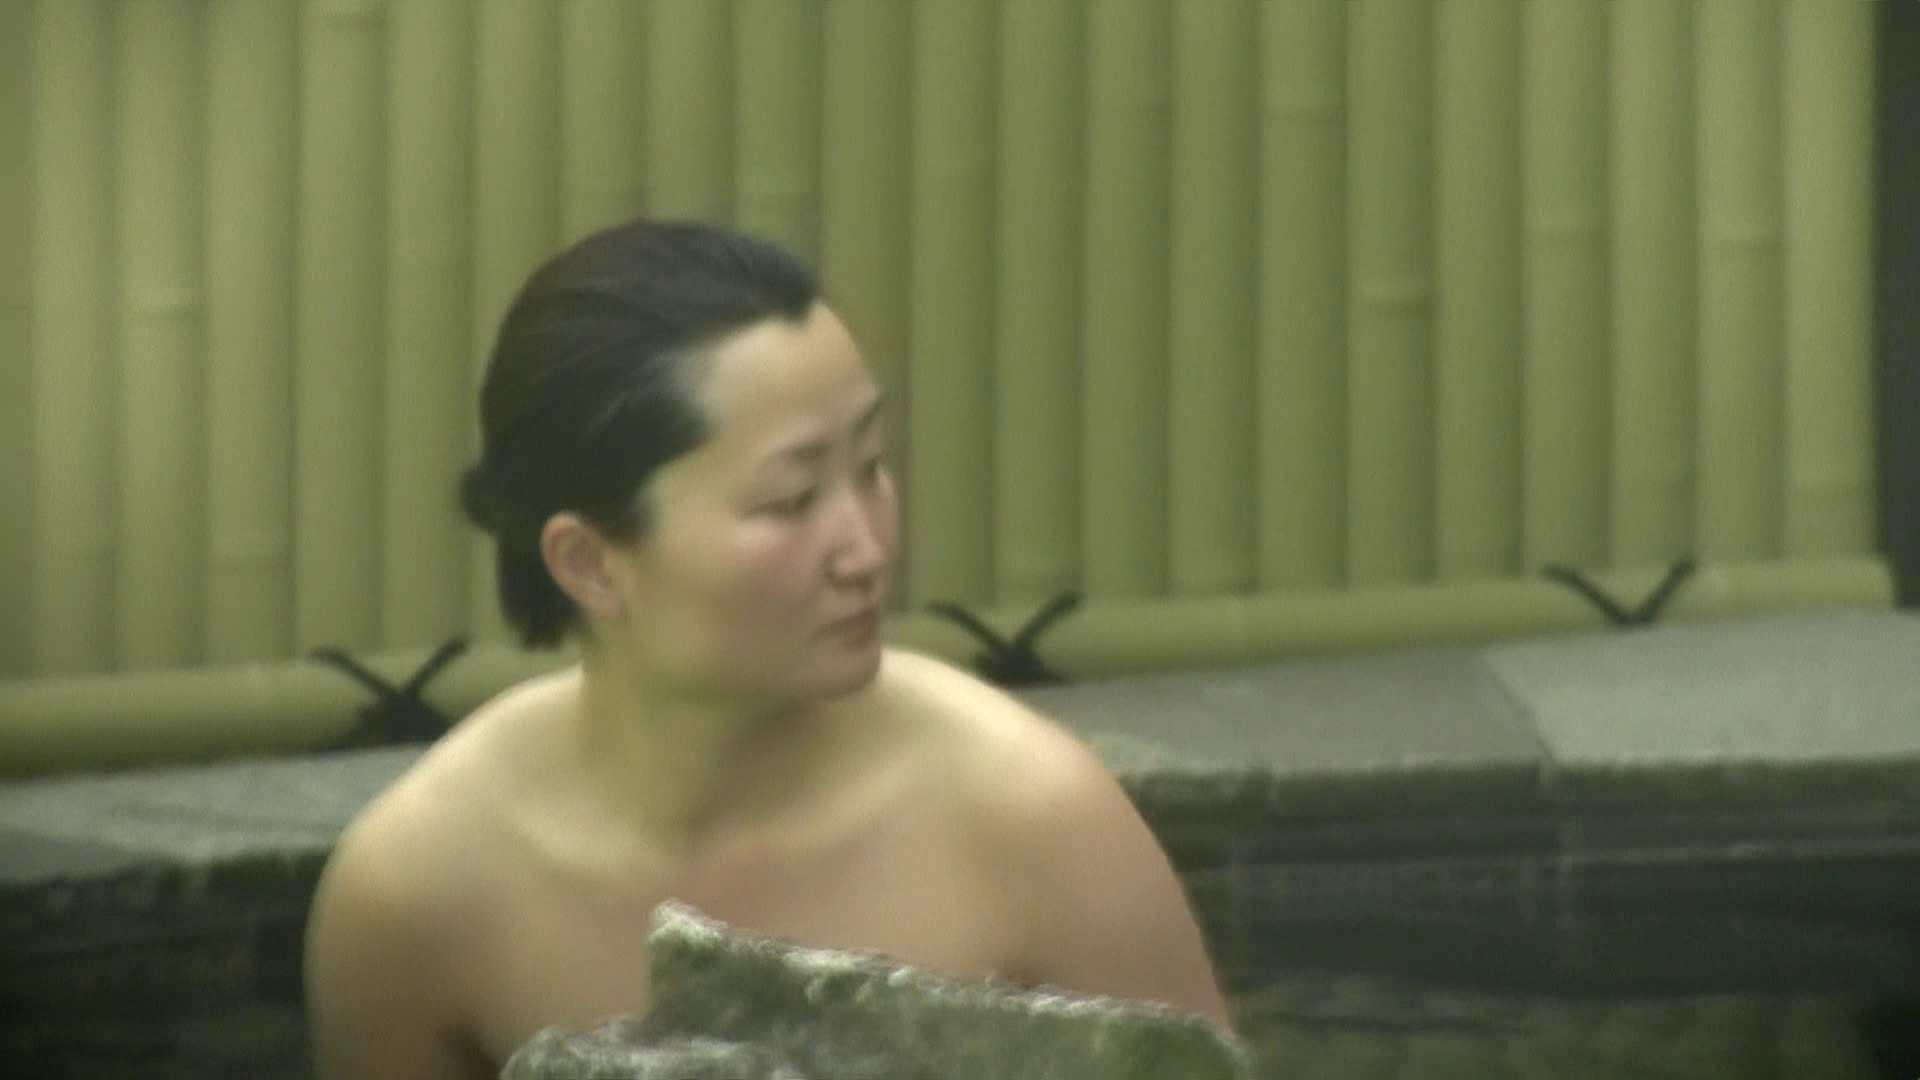 Aquaな露天風呂Vol.632 盗撮シリーズ | 露天風呂編  100PIX 3